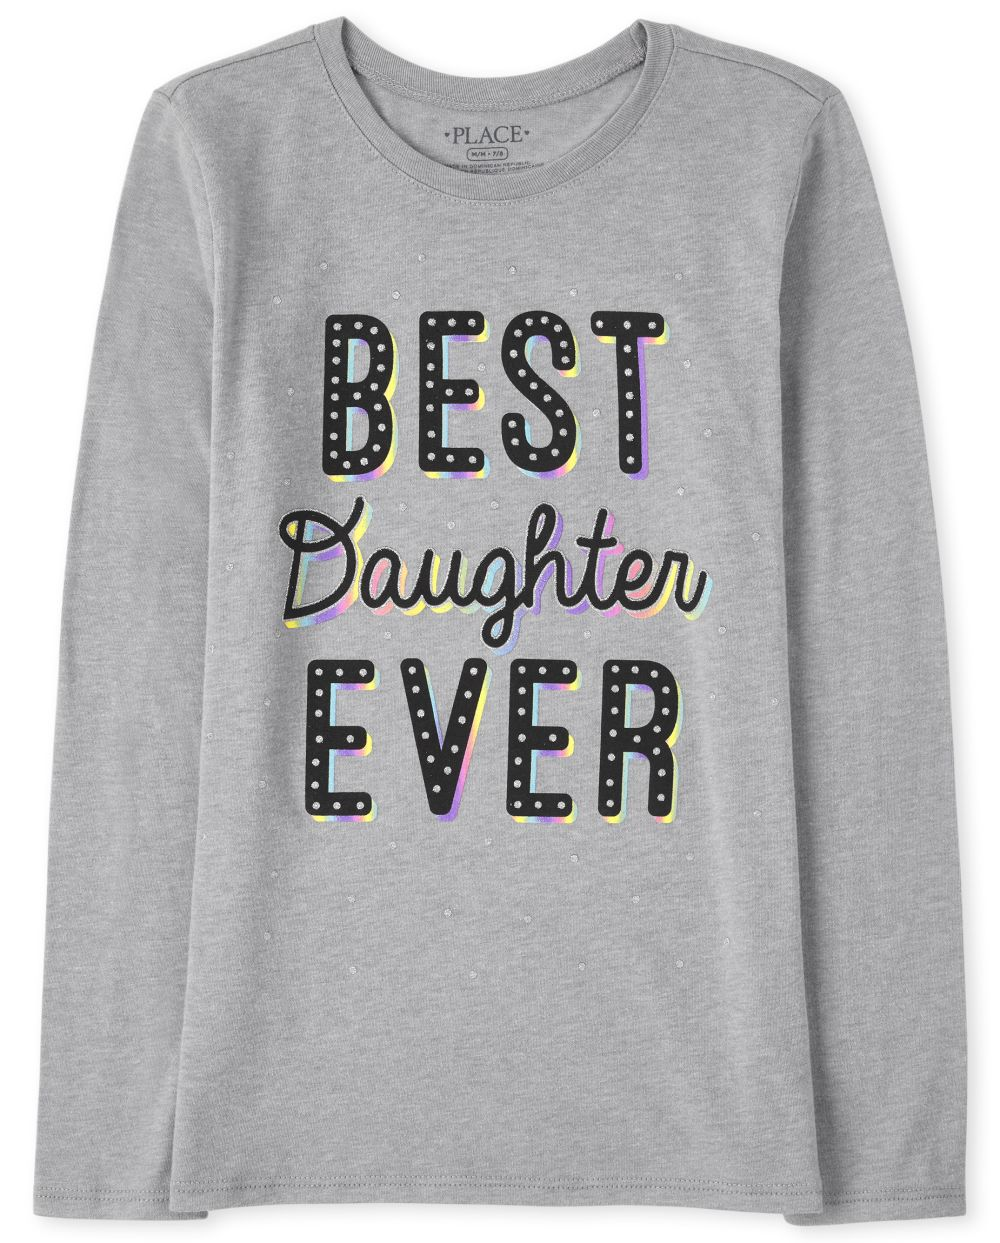 Best Daughter Graphic Tee - Gray T-Shirt